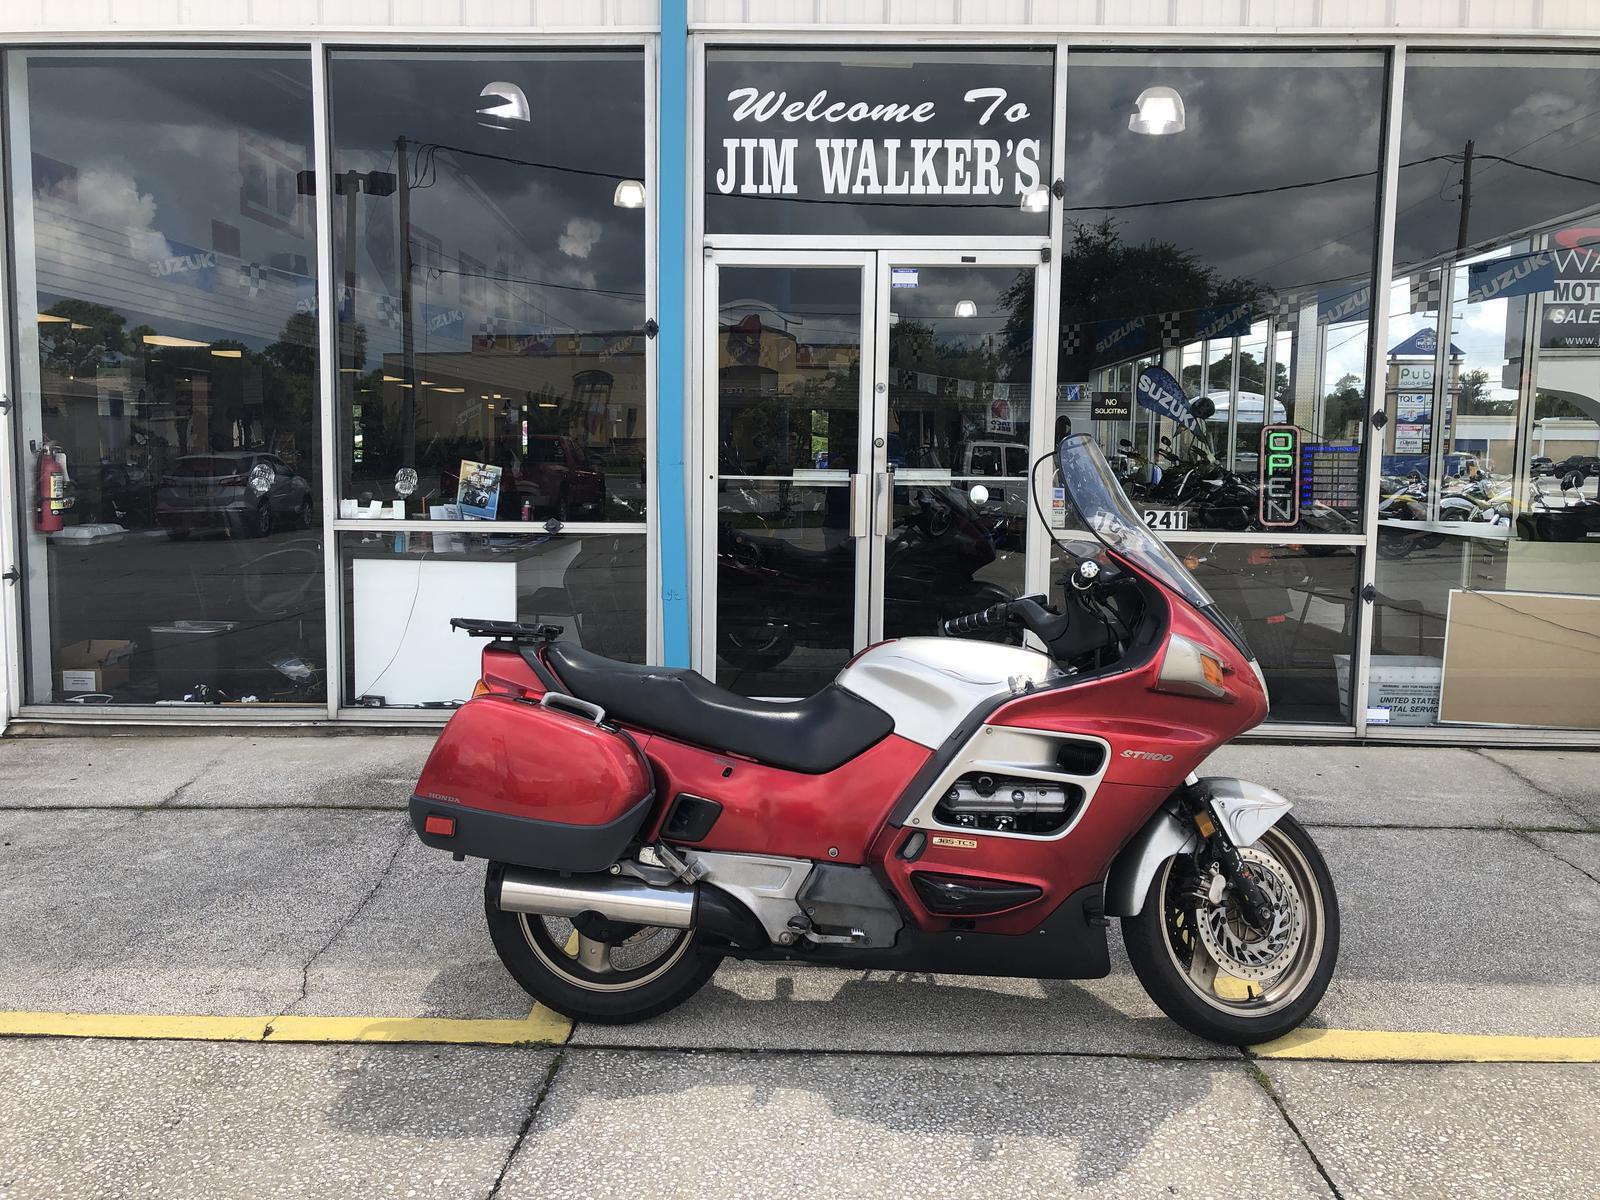 Inventory Jim Walker's Motorcycles South Daytona, FL (386